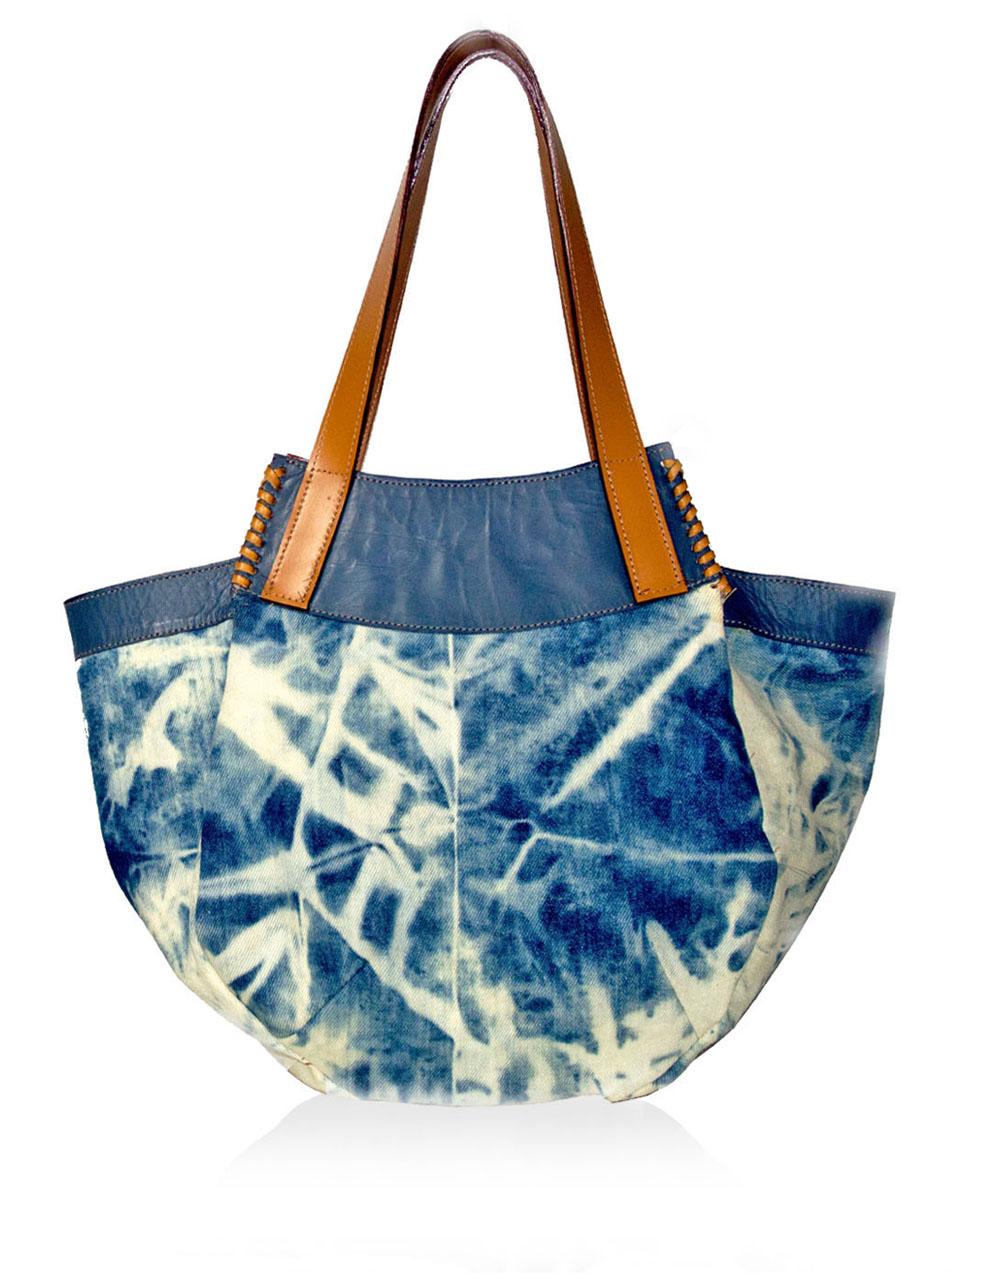 ODELINA Denim/Caramel Leather